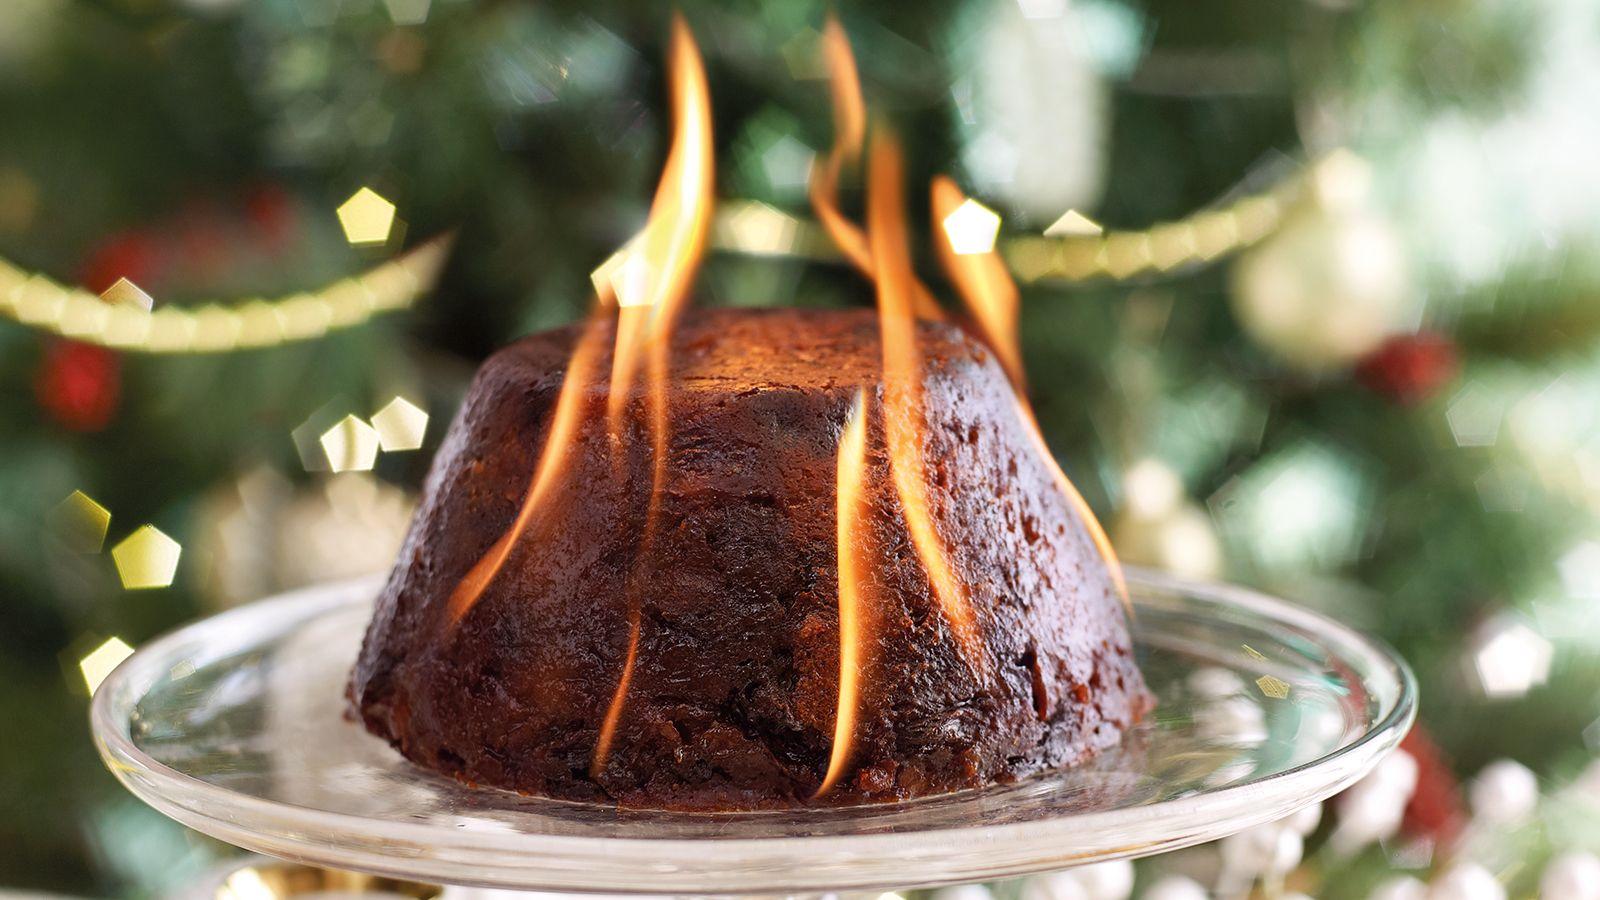 Best Christmas Pudding Recipe 2020 Christmas pudding recipe: Best Xmas pudding recipes